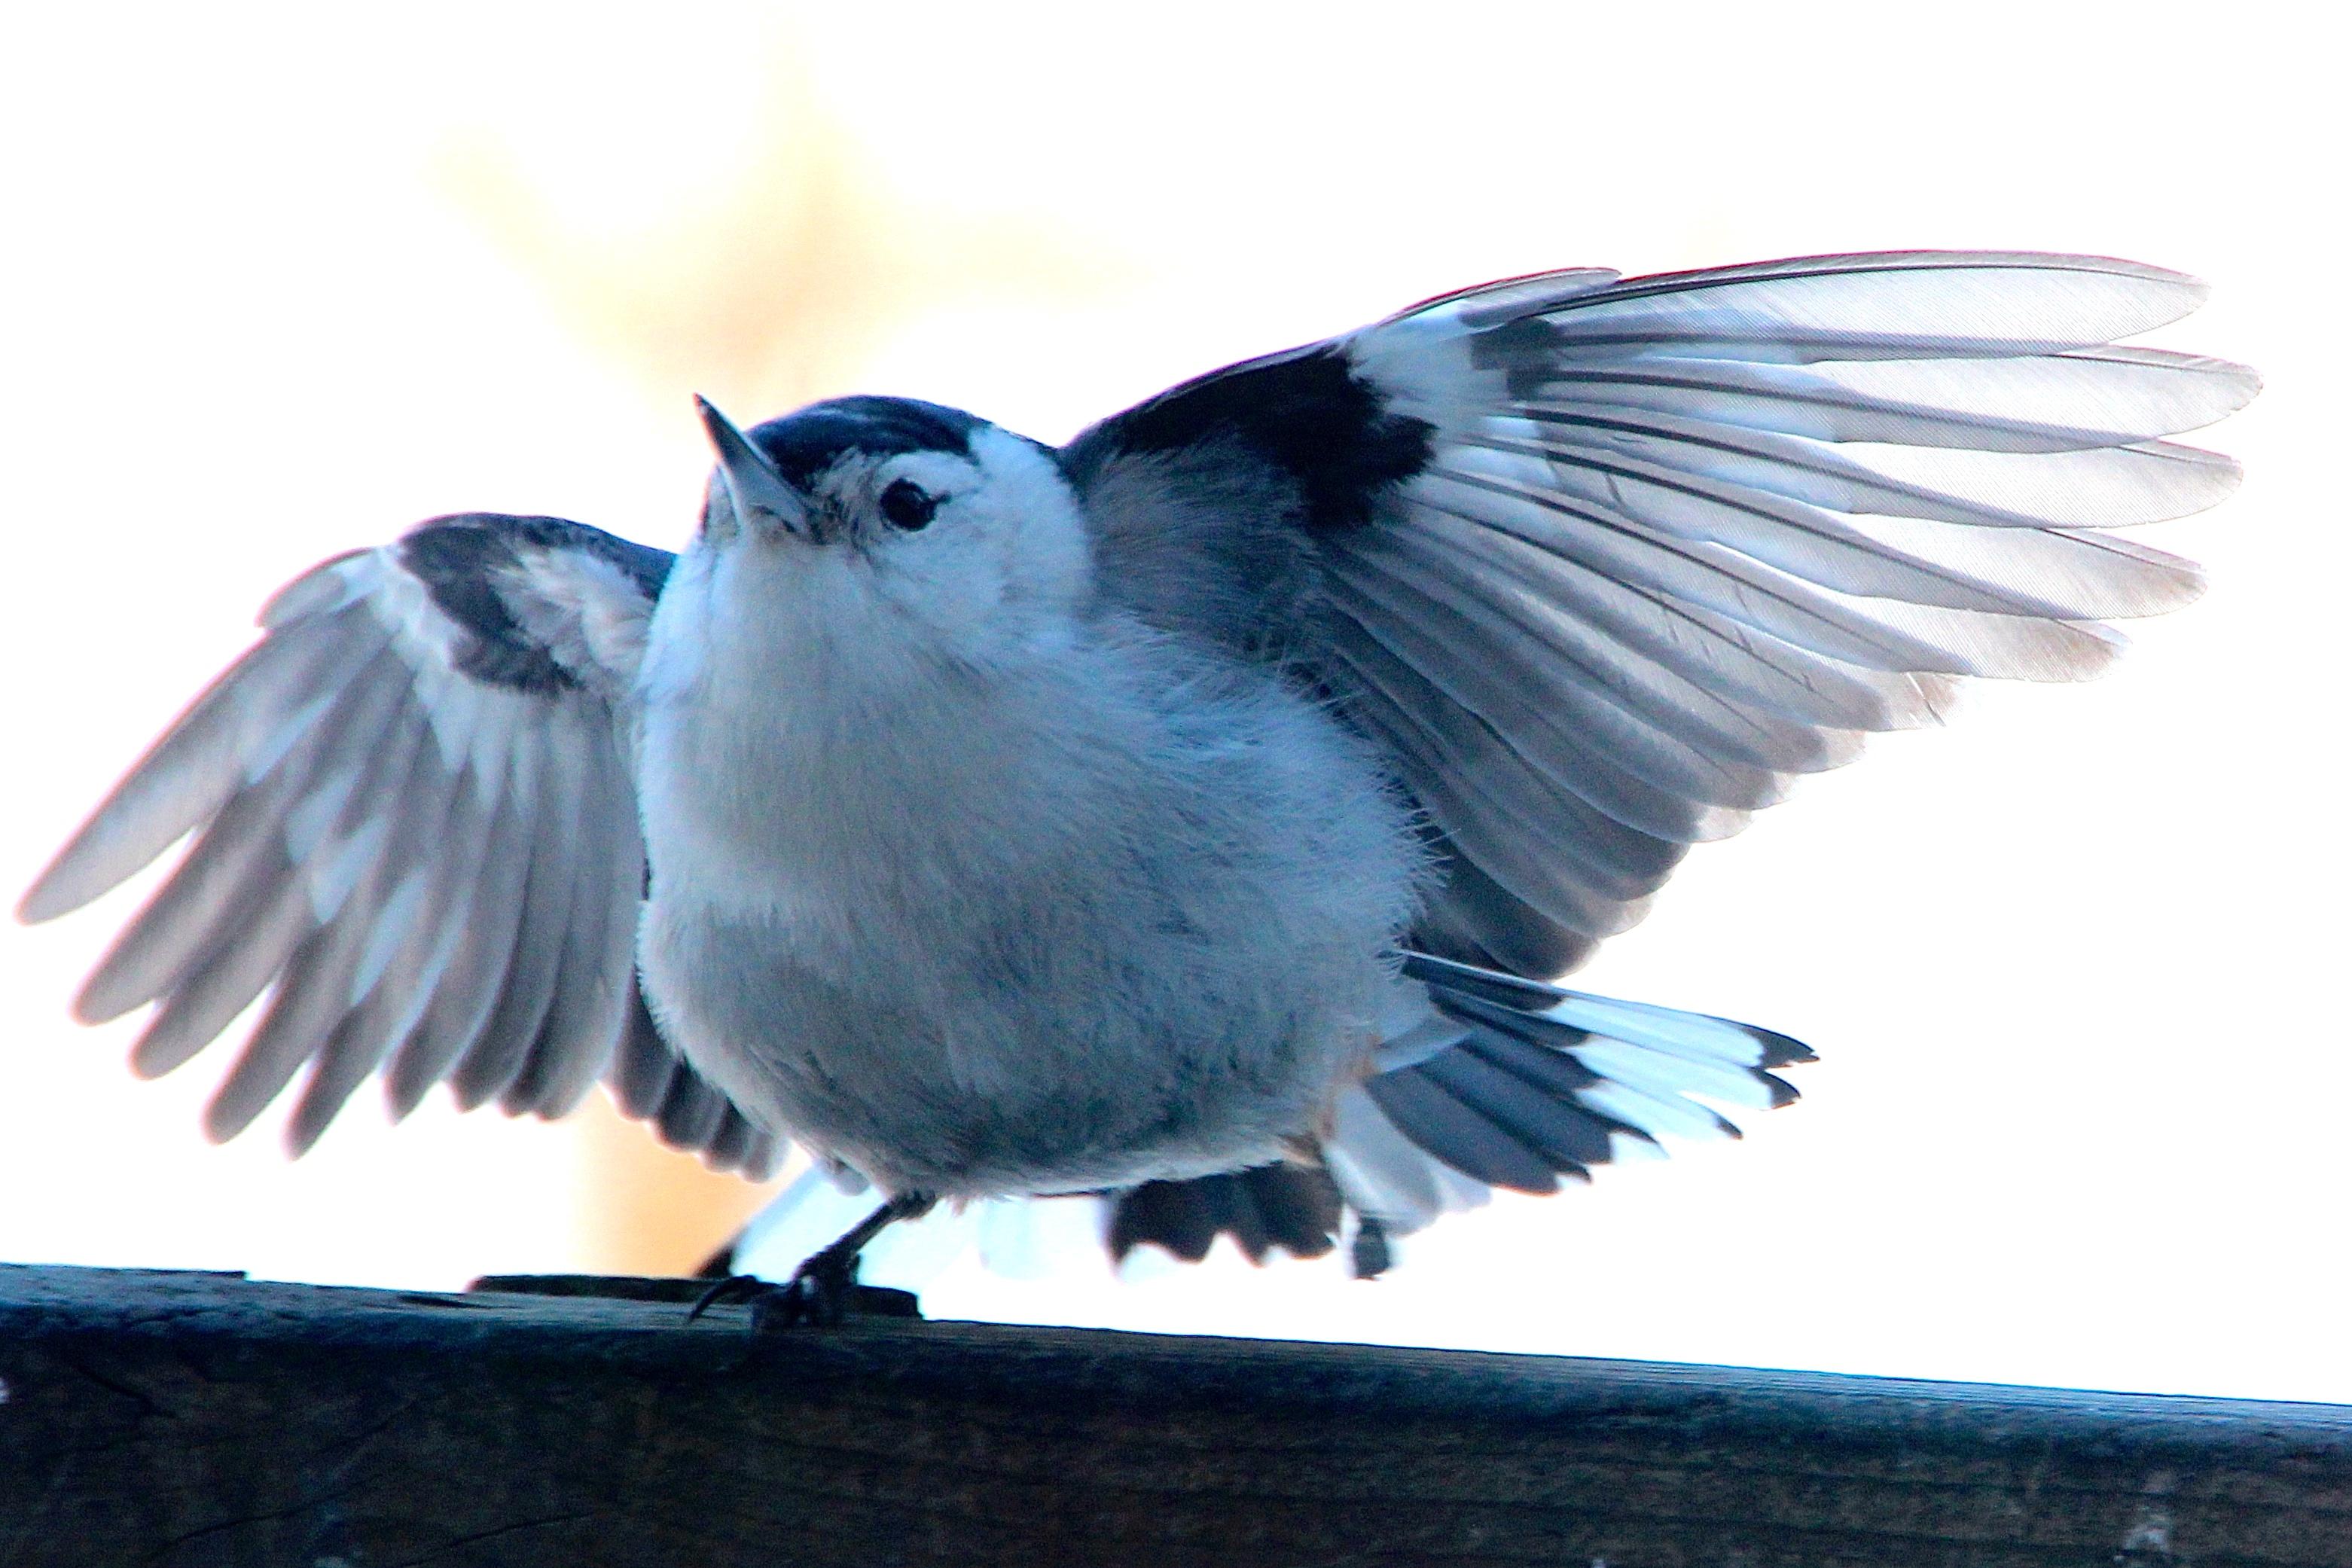 Nuthatch defending feeder 3.6.15